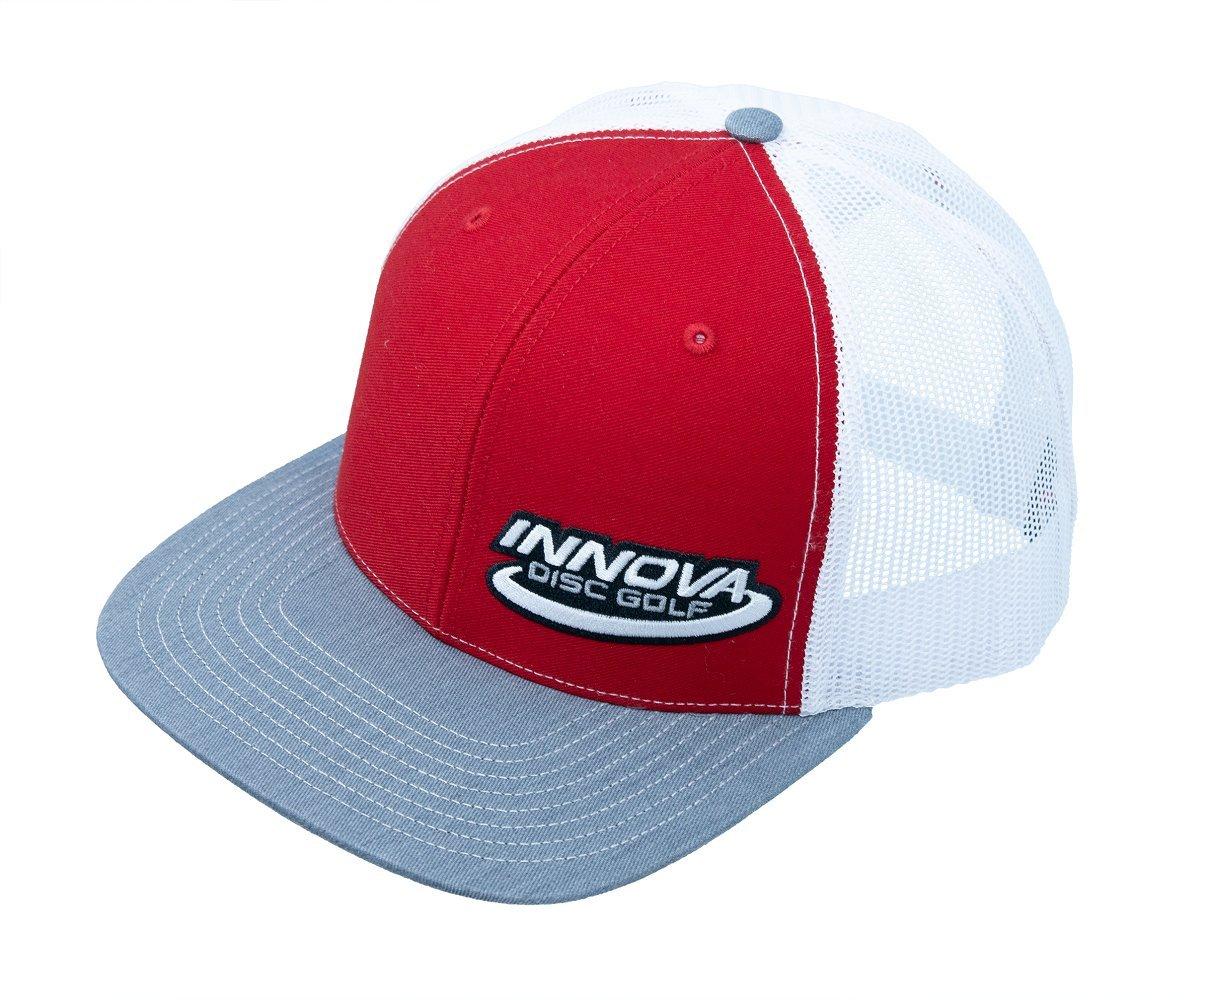 Innova Disc GolfロゴスナップバックTruckerメッシュディスクゴルフ帽子 B07DKHCQY6 Red/Heather/White